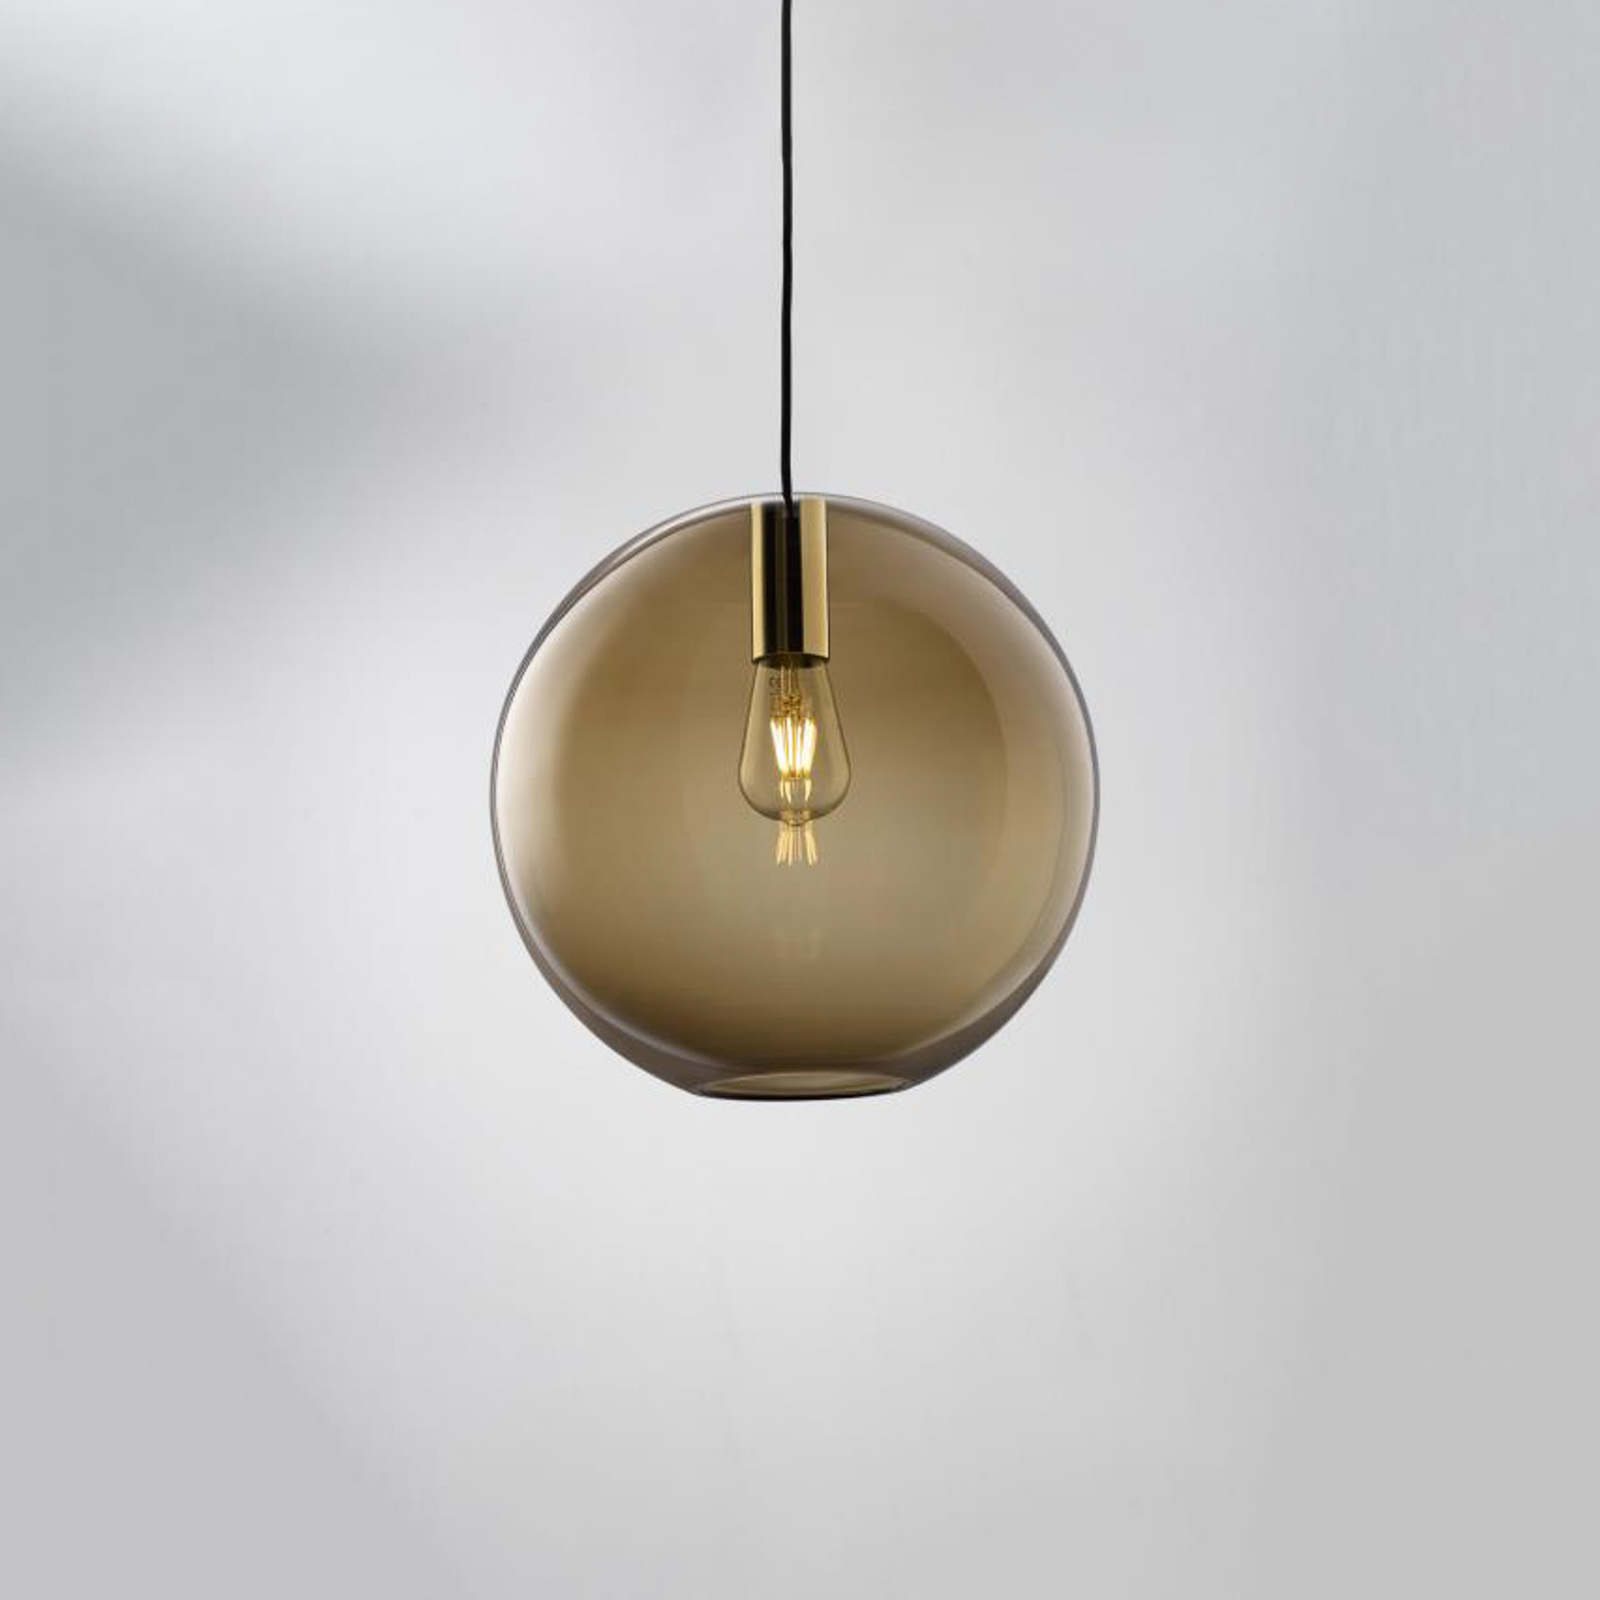 LOUM Loon Ball hængelampe, brunt glas, krom